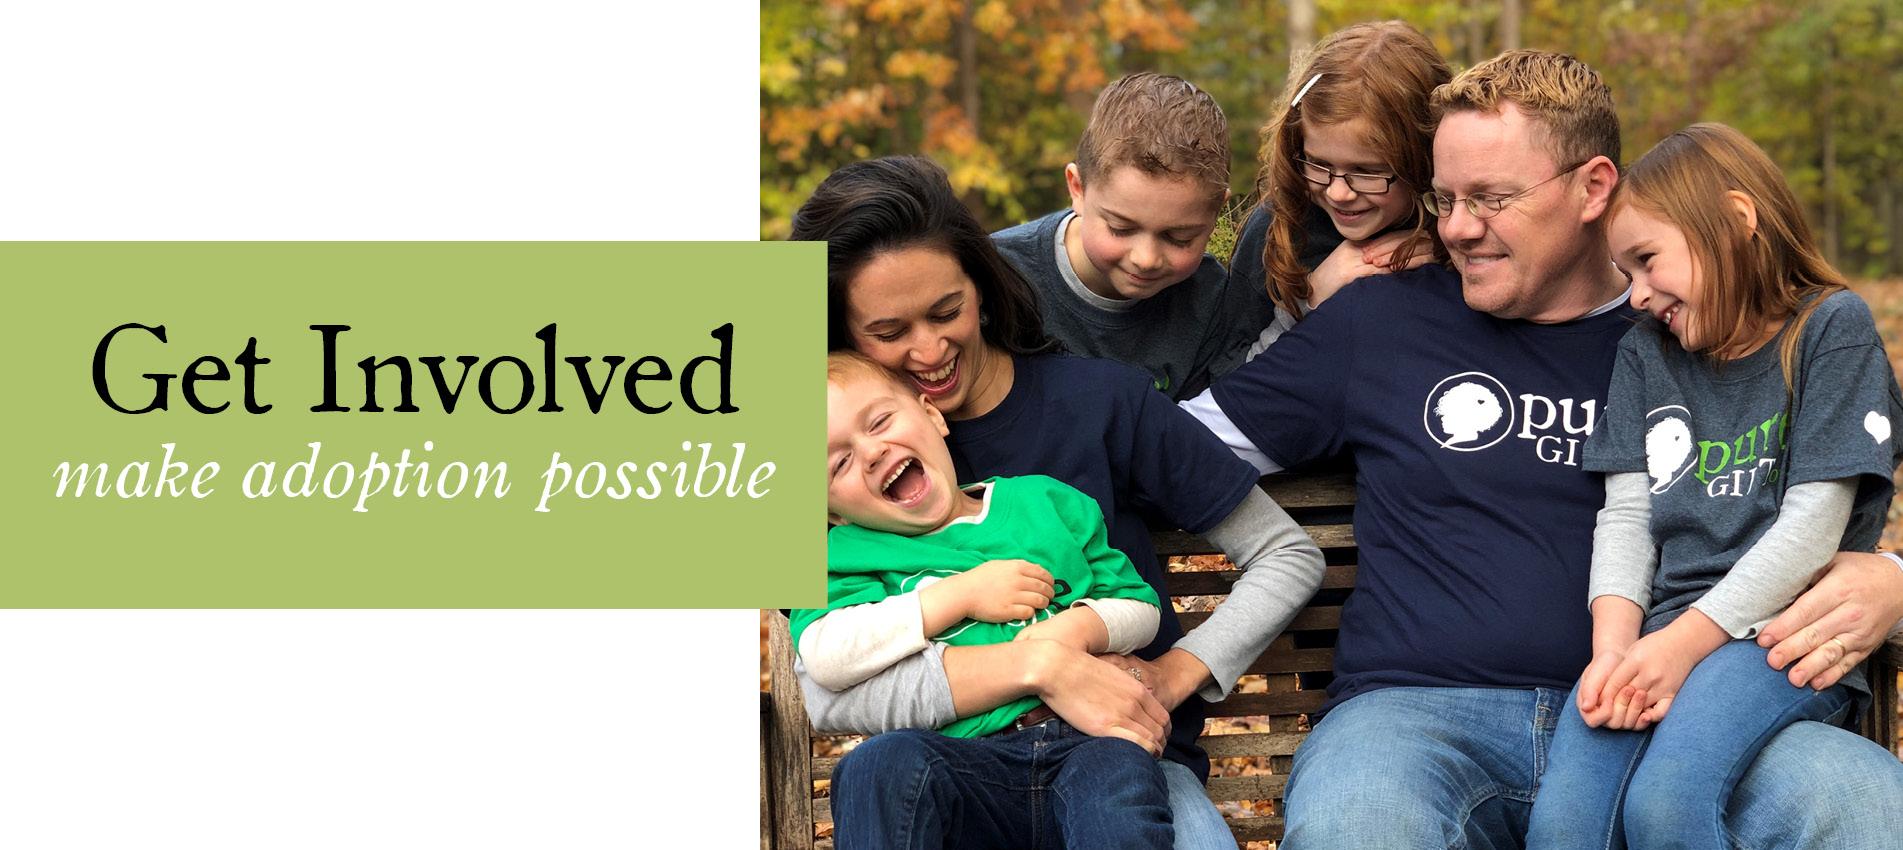 Make adoption possible